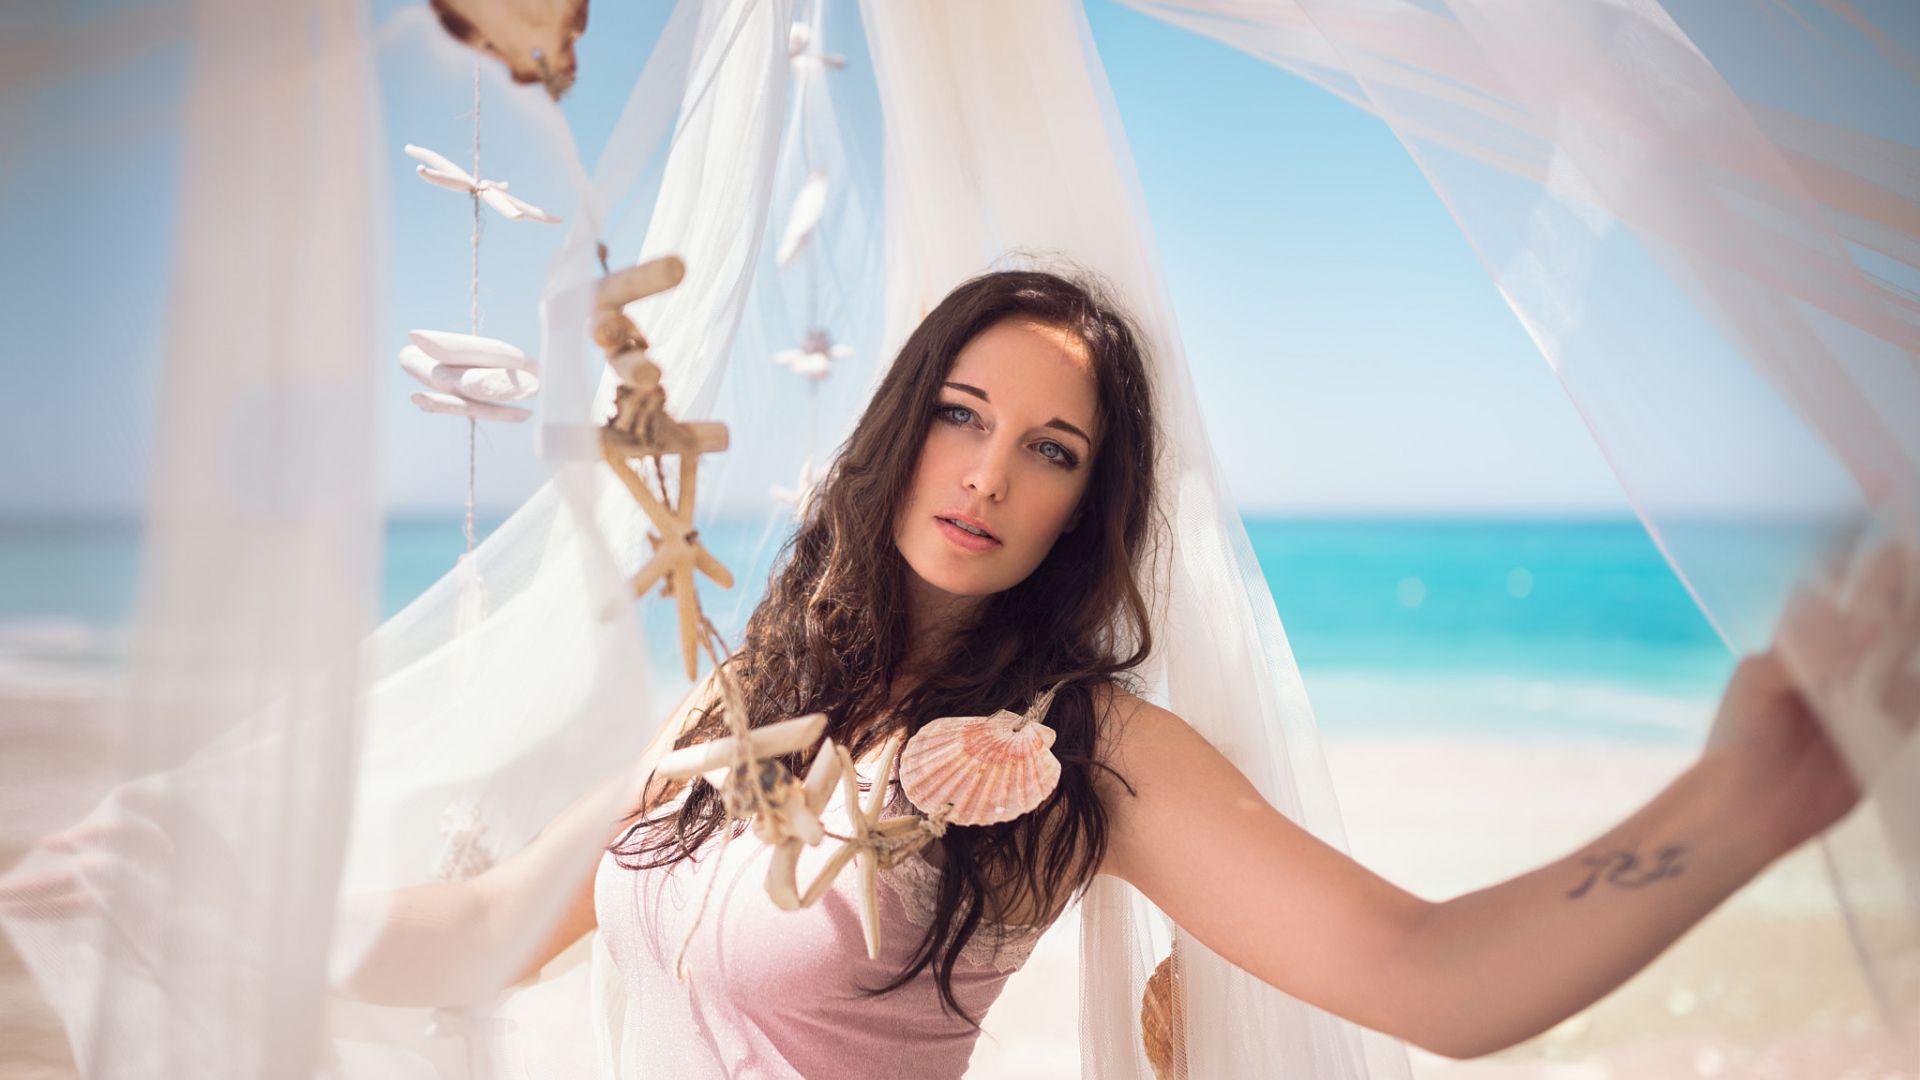 Wallpaper Holiday, beach, girl, model